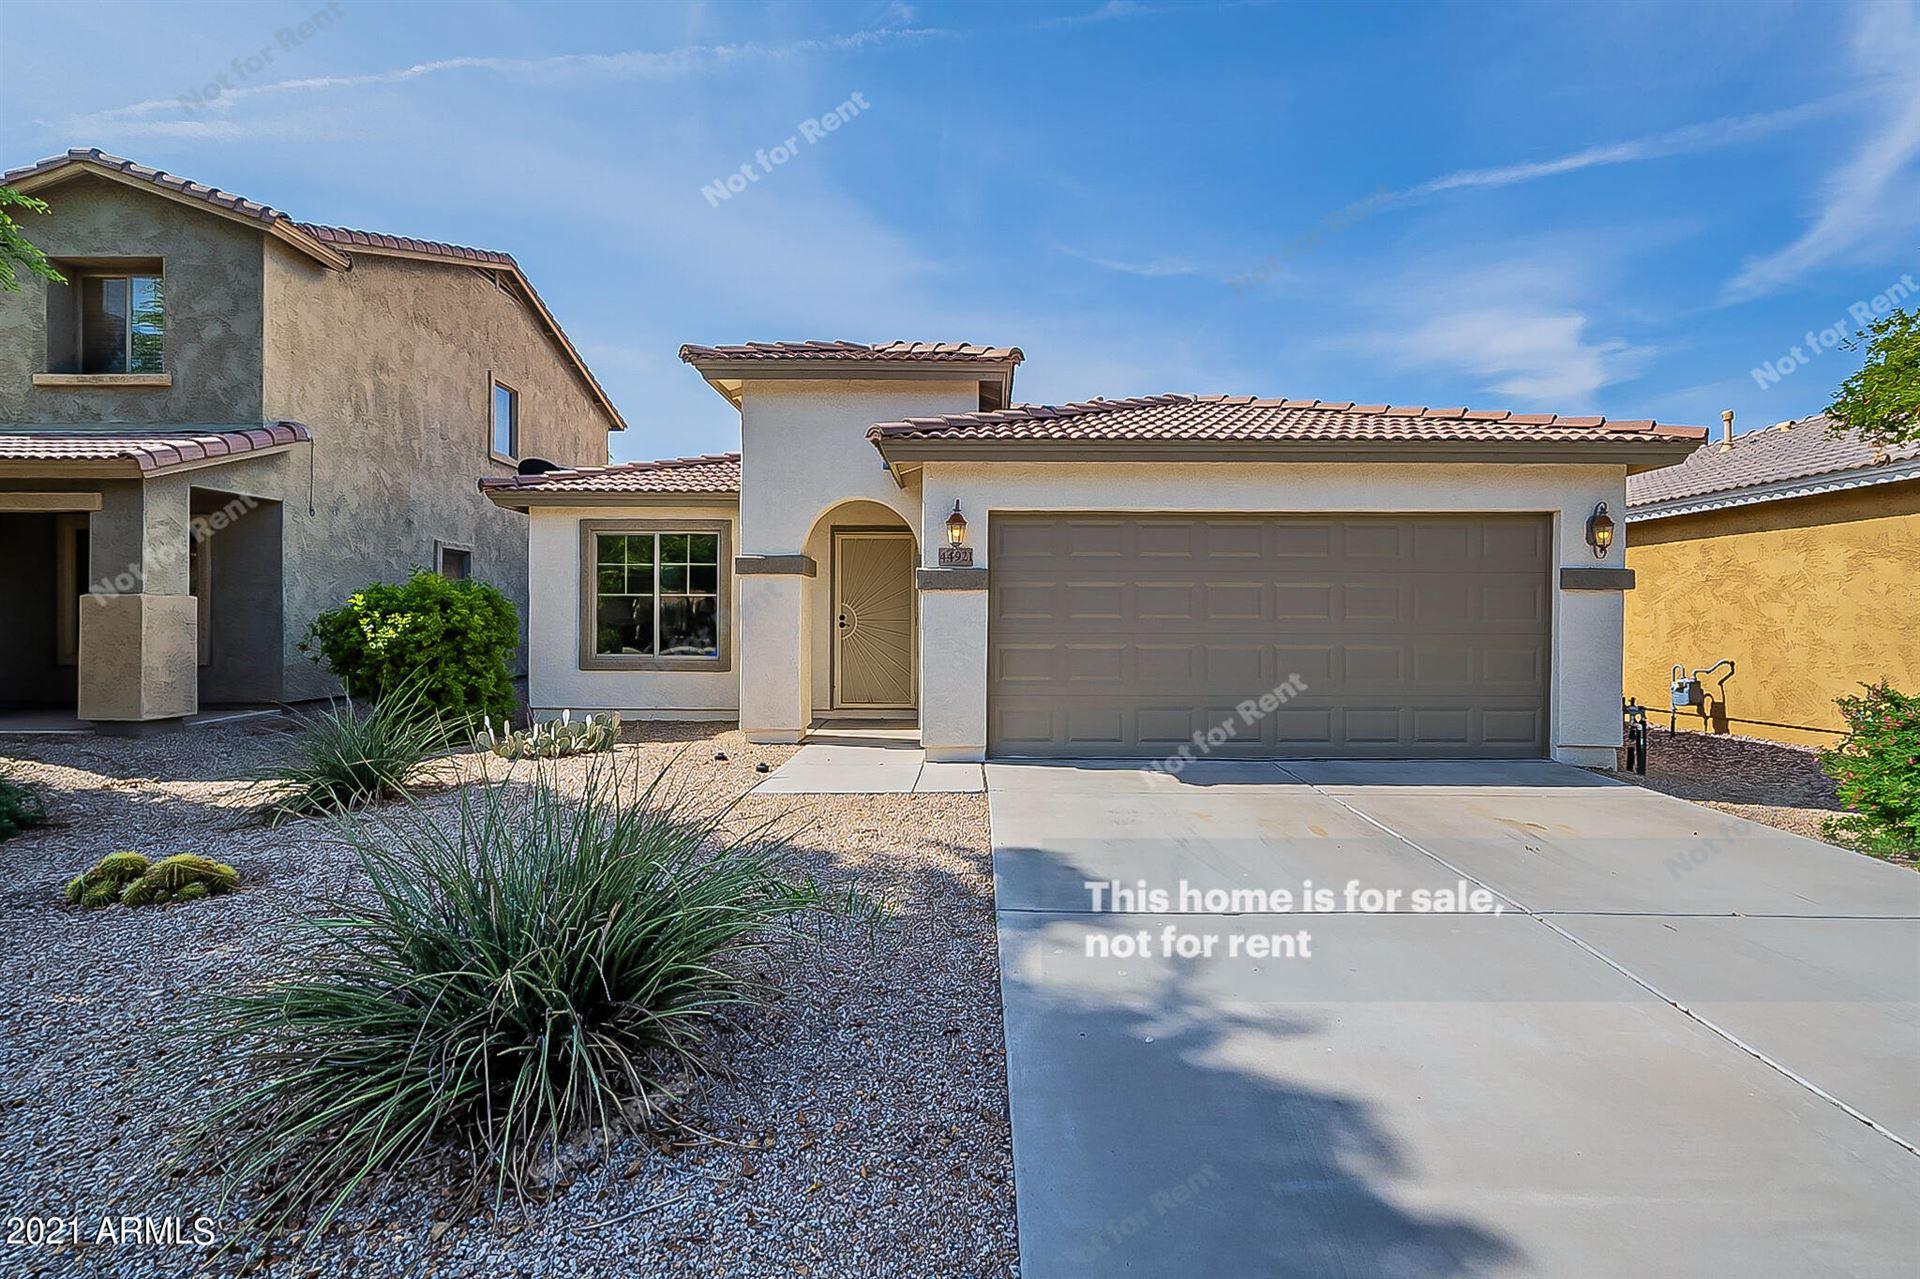 Photo for 44921 W MIRAMAR Road, Maricopa, AZ 85139 (MLS # 6282030)